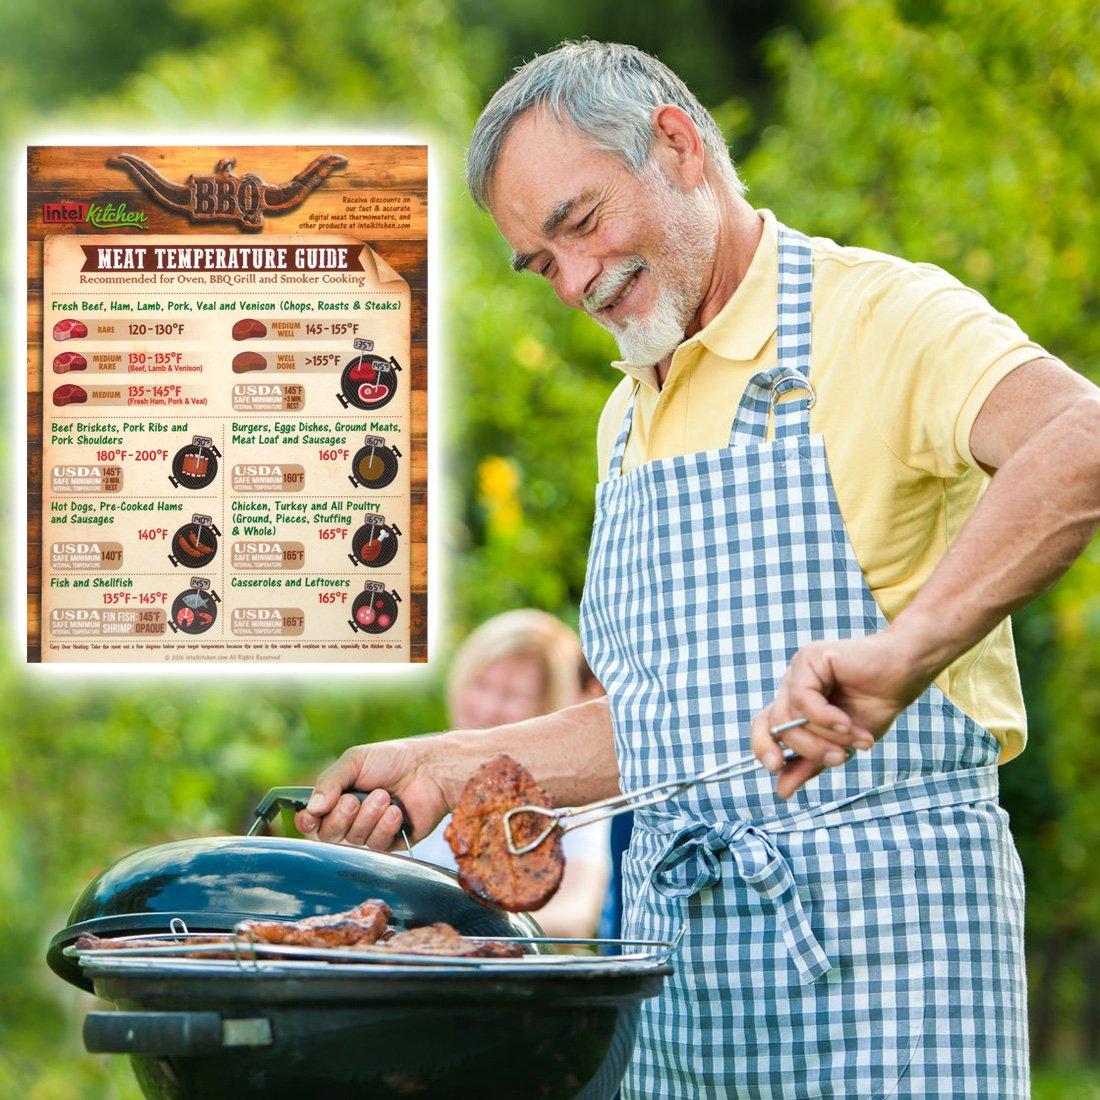 Alta Precisión Termómetro Digital barbacoa + Temperatura de carne Guía Imán + 2 pilas gratuitas by Intel Cocina para Horno y barbacoa cocinar.